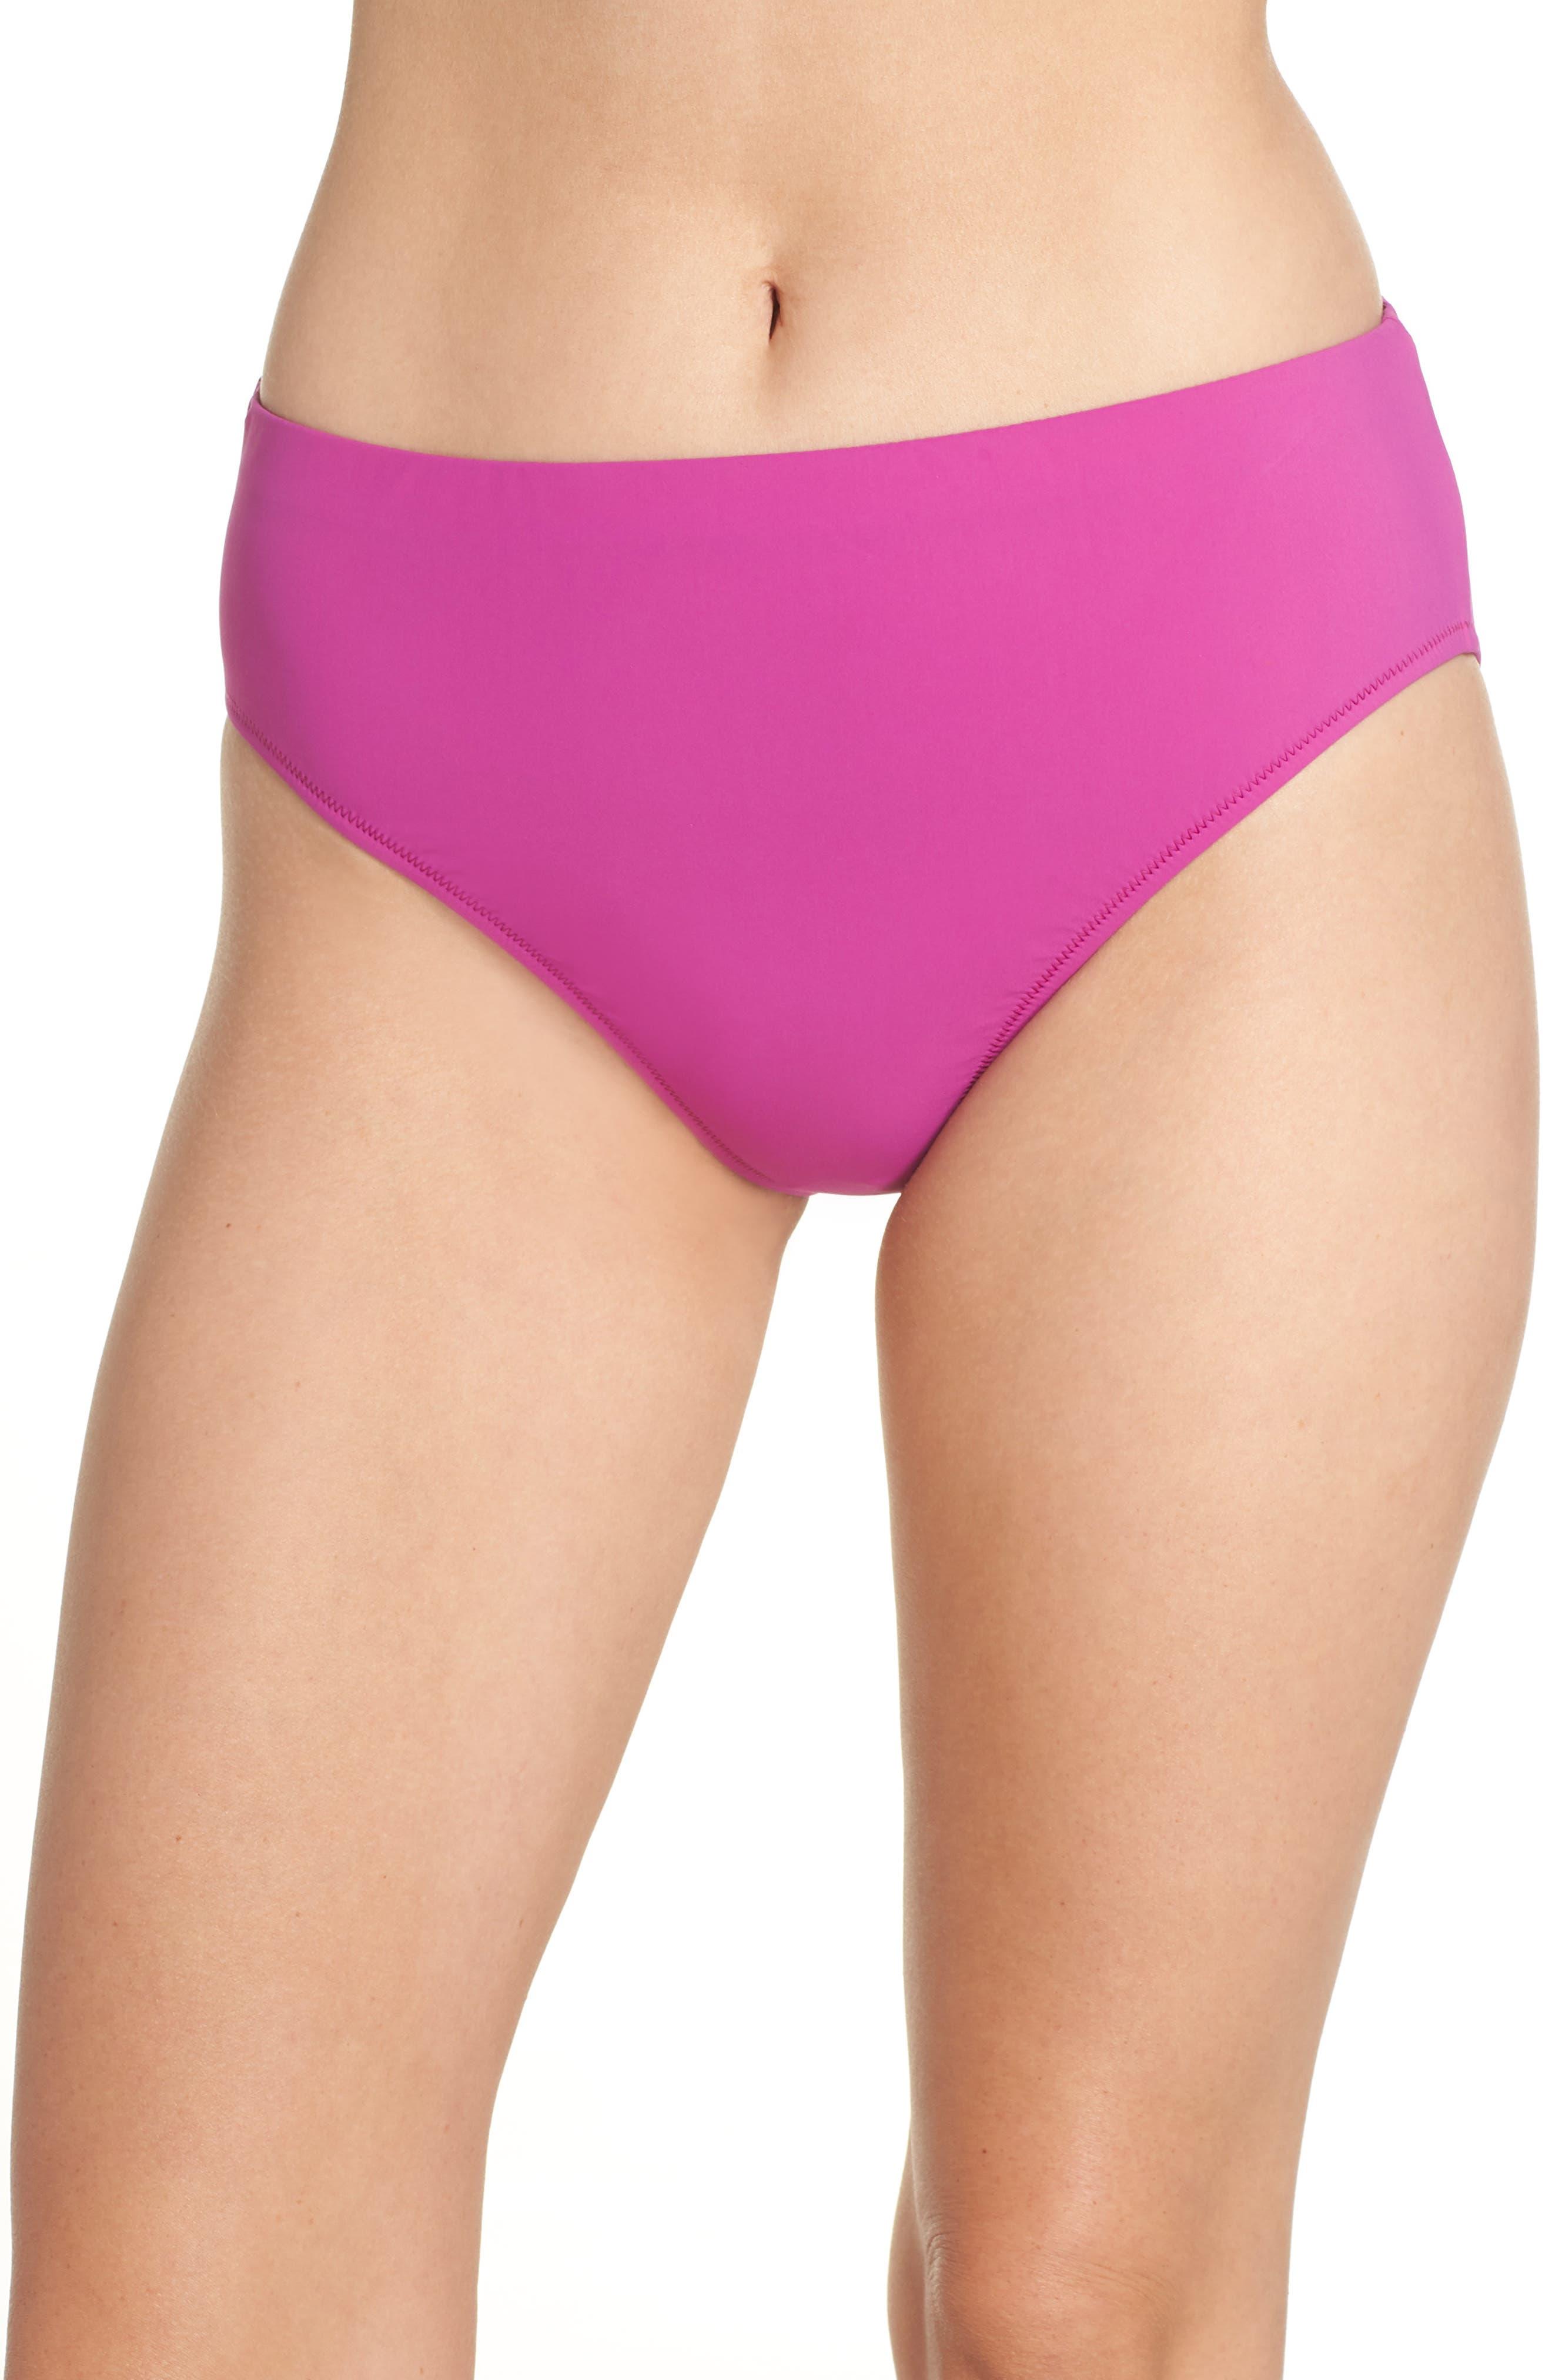 Bikini Bottoms,                             Main thumbnail 1, color,                             WARM VIOLA